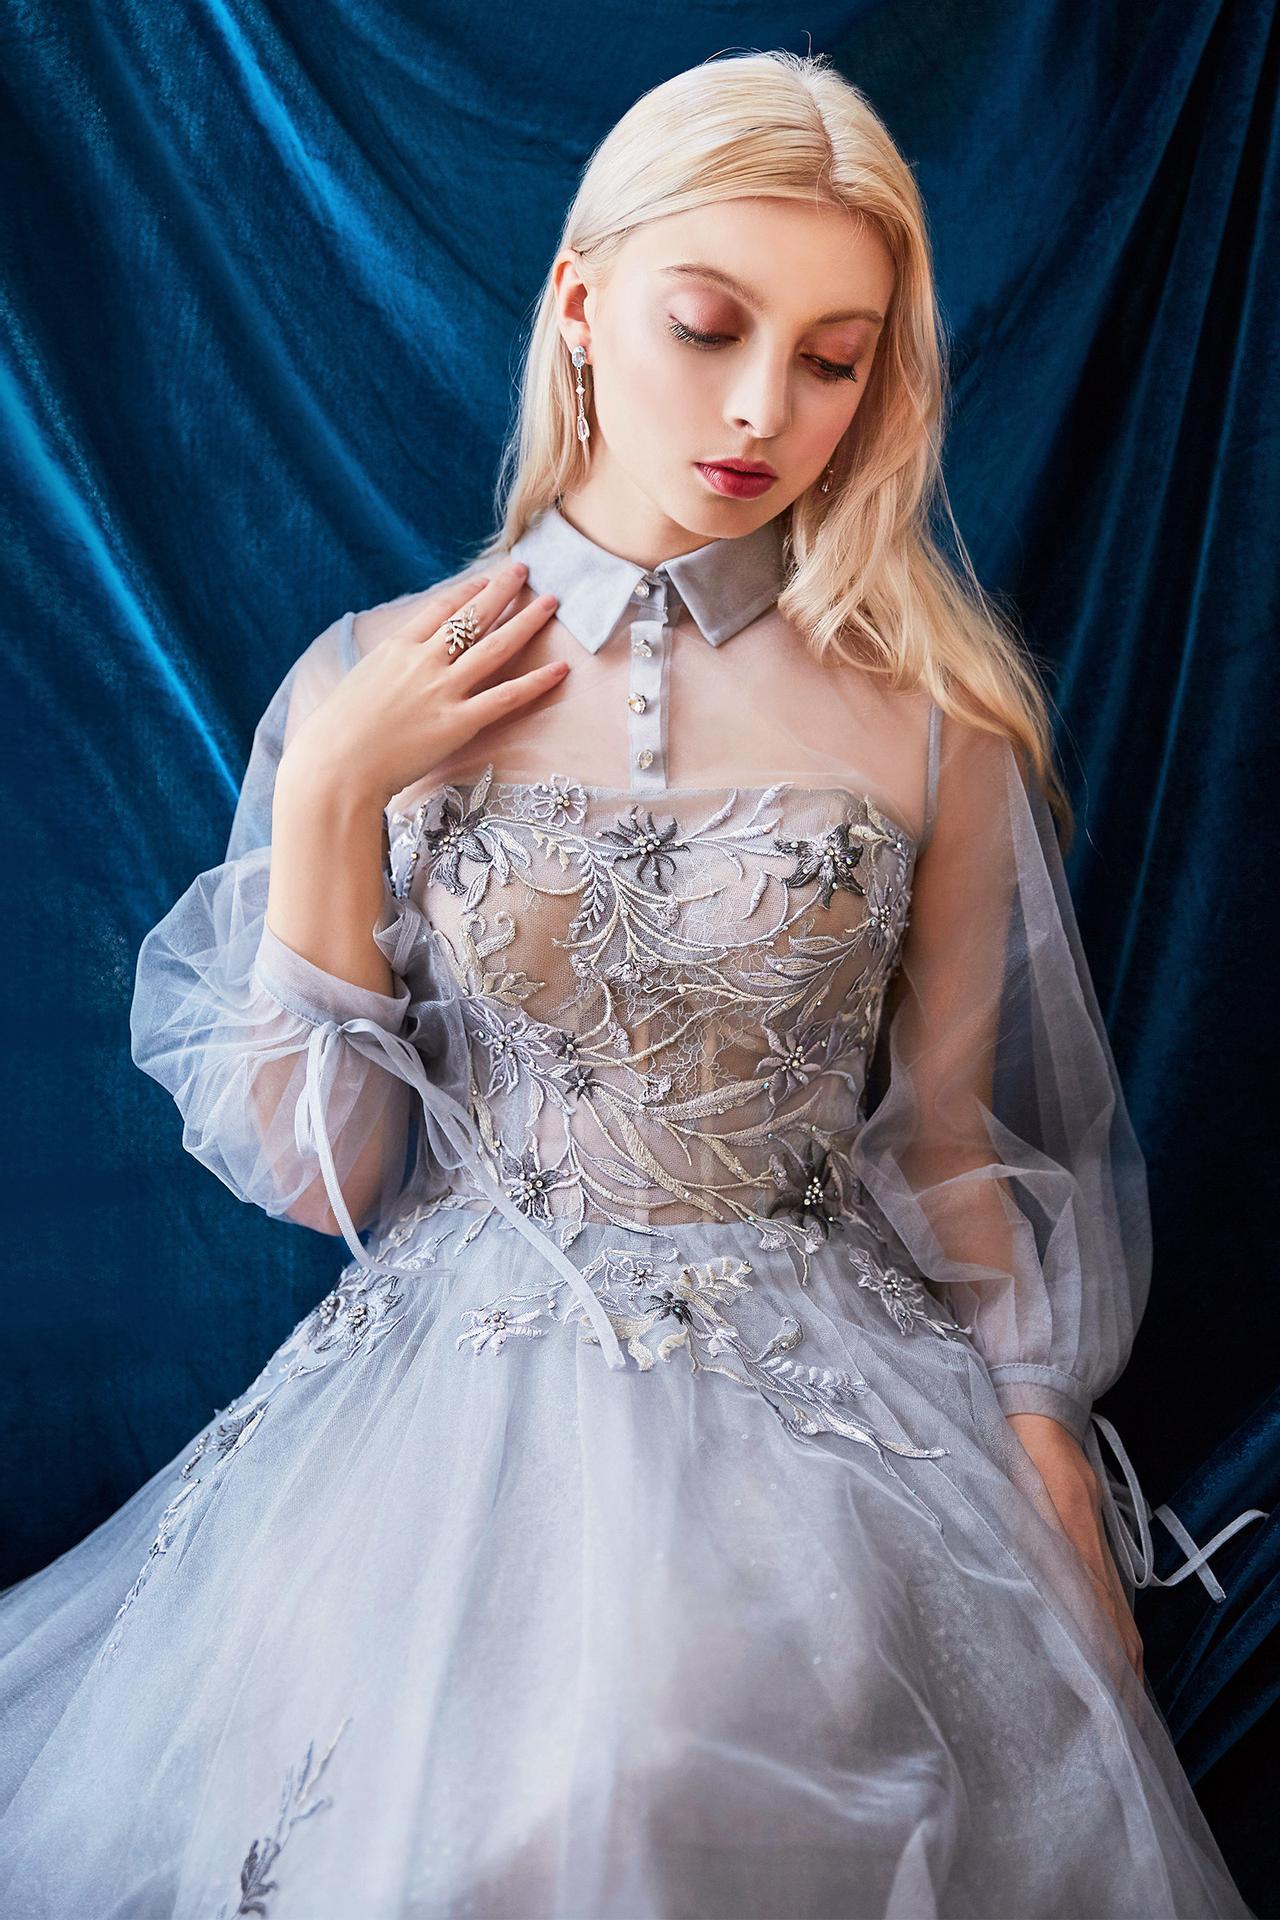 Nové spoločenské šaty :) - Obrázok č. 50